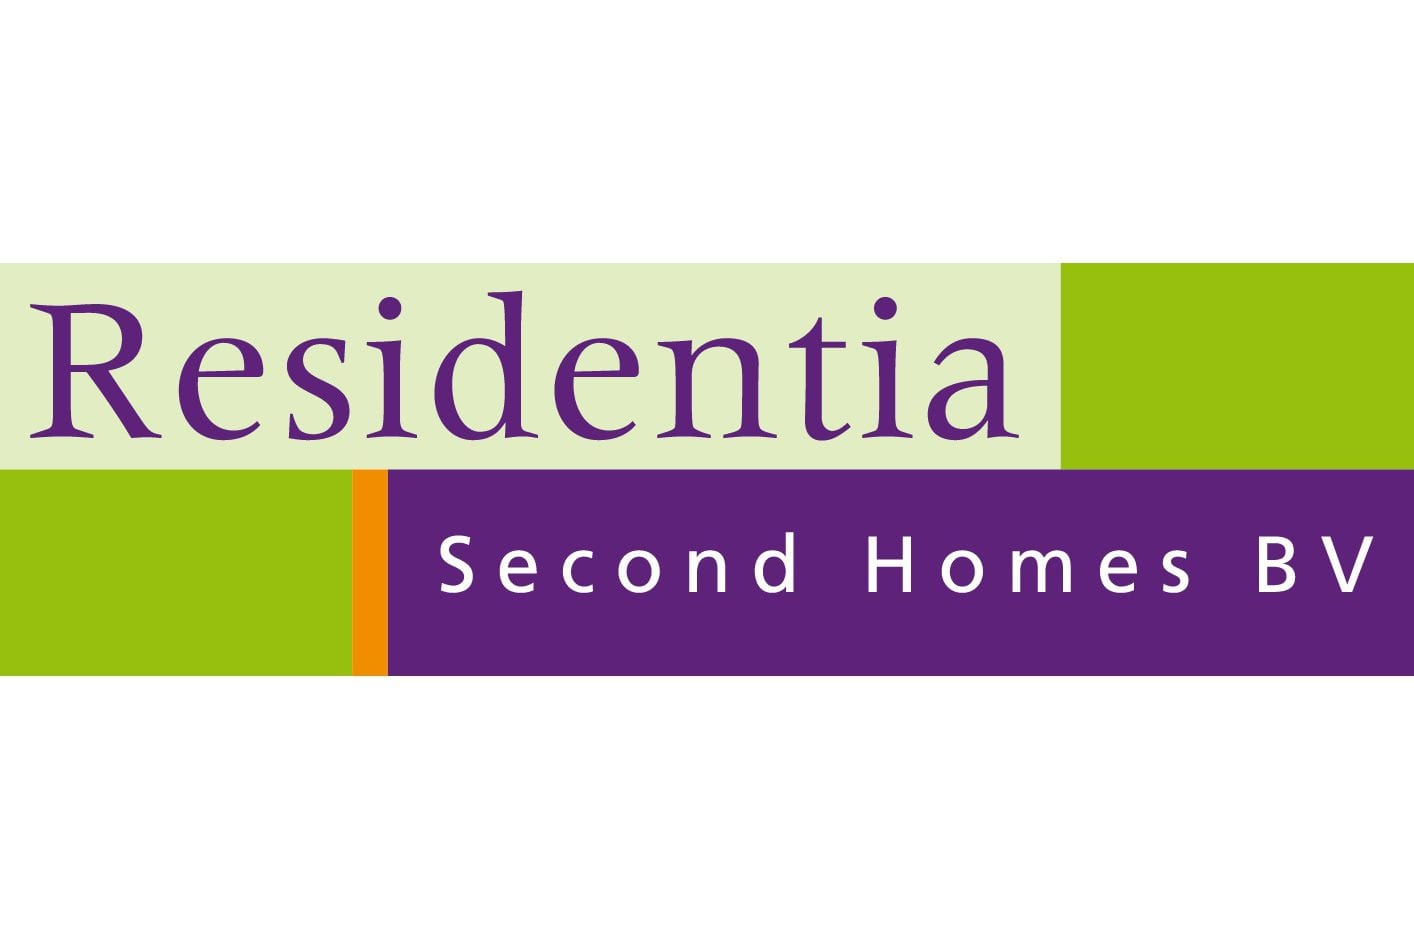 Residentia SH, logo